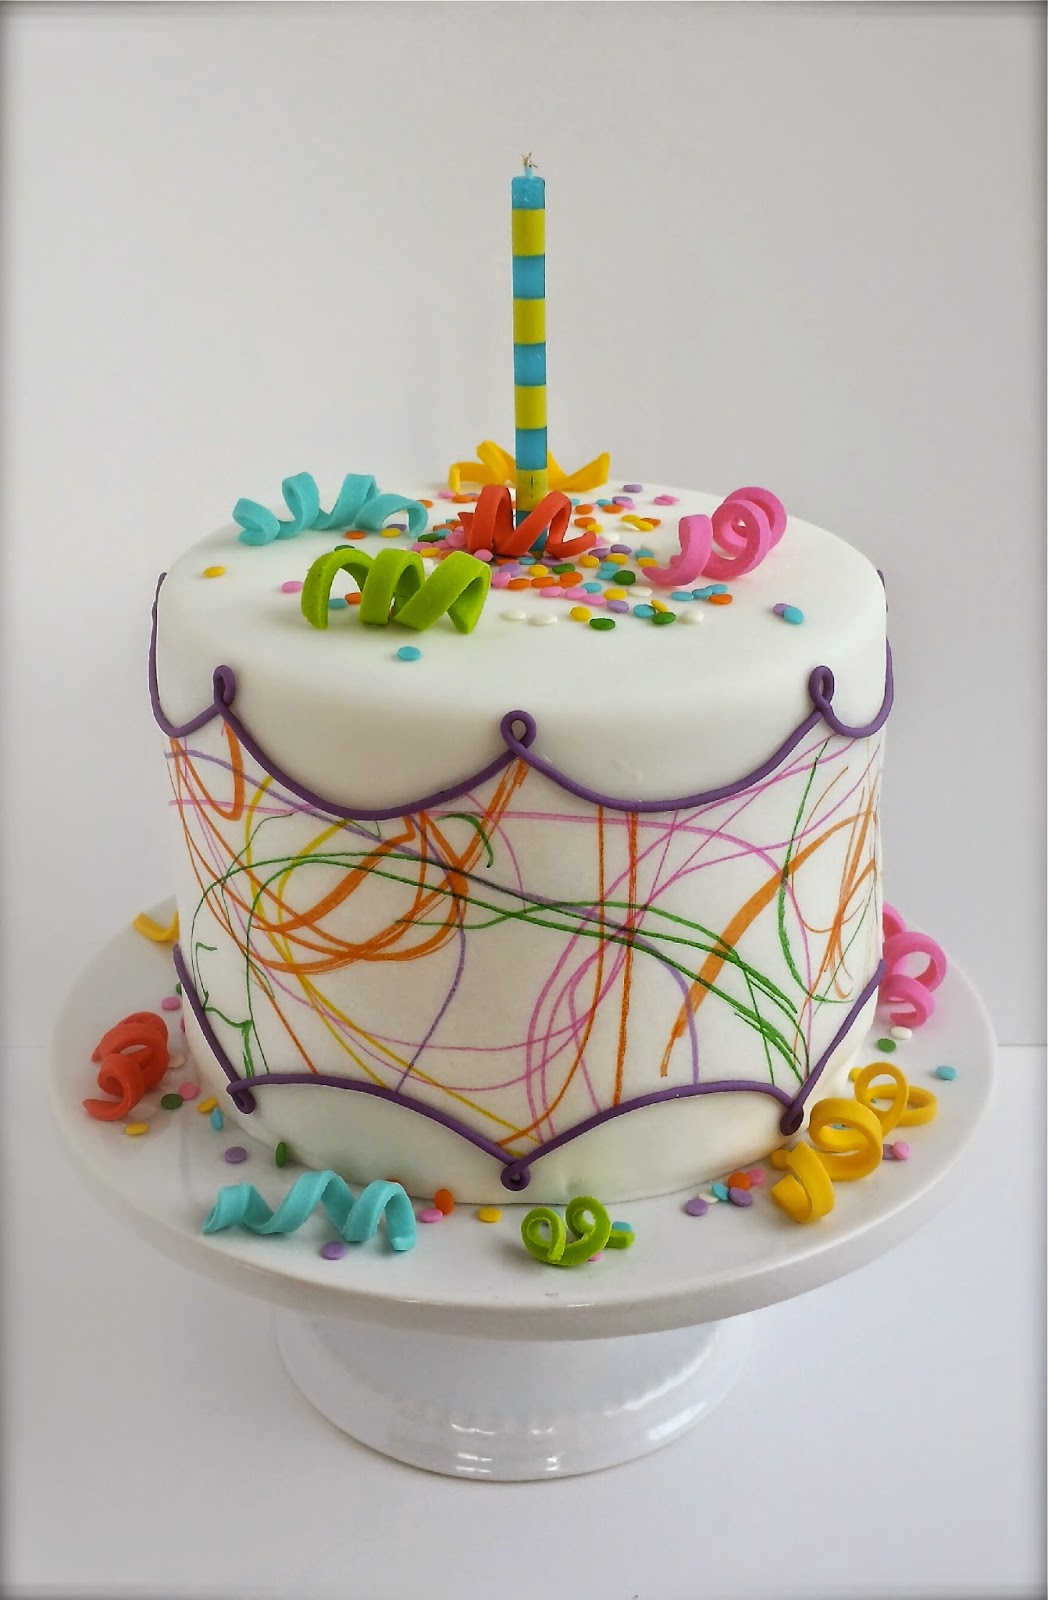 Cake Blog: Toddler Art Birthday Cake